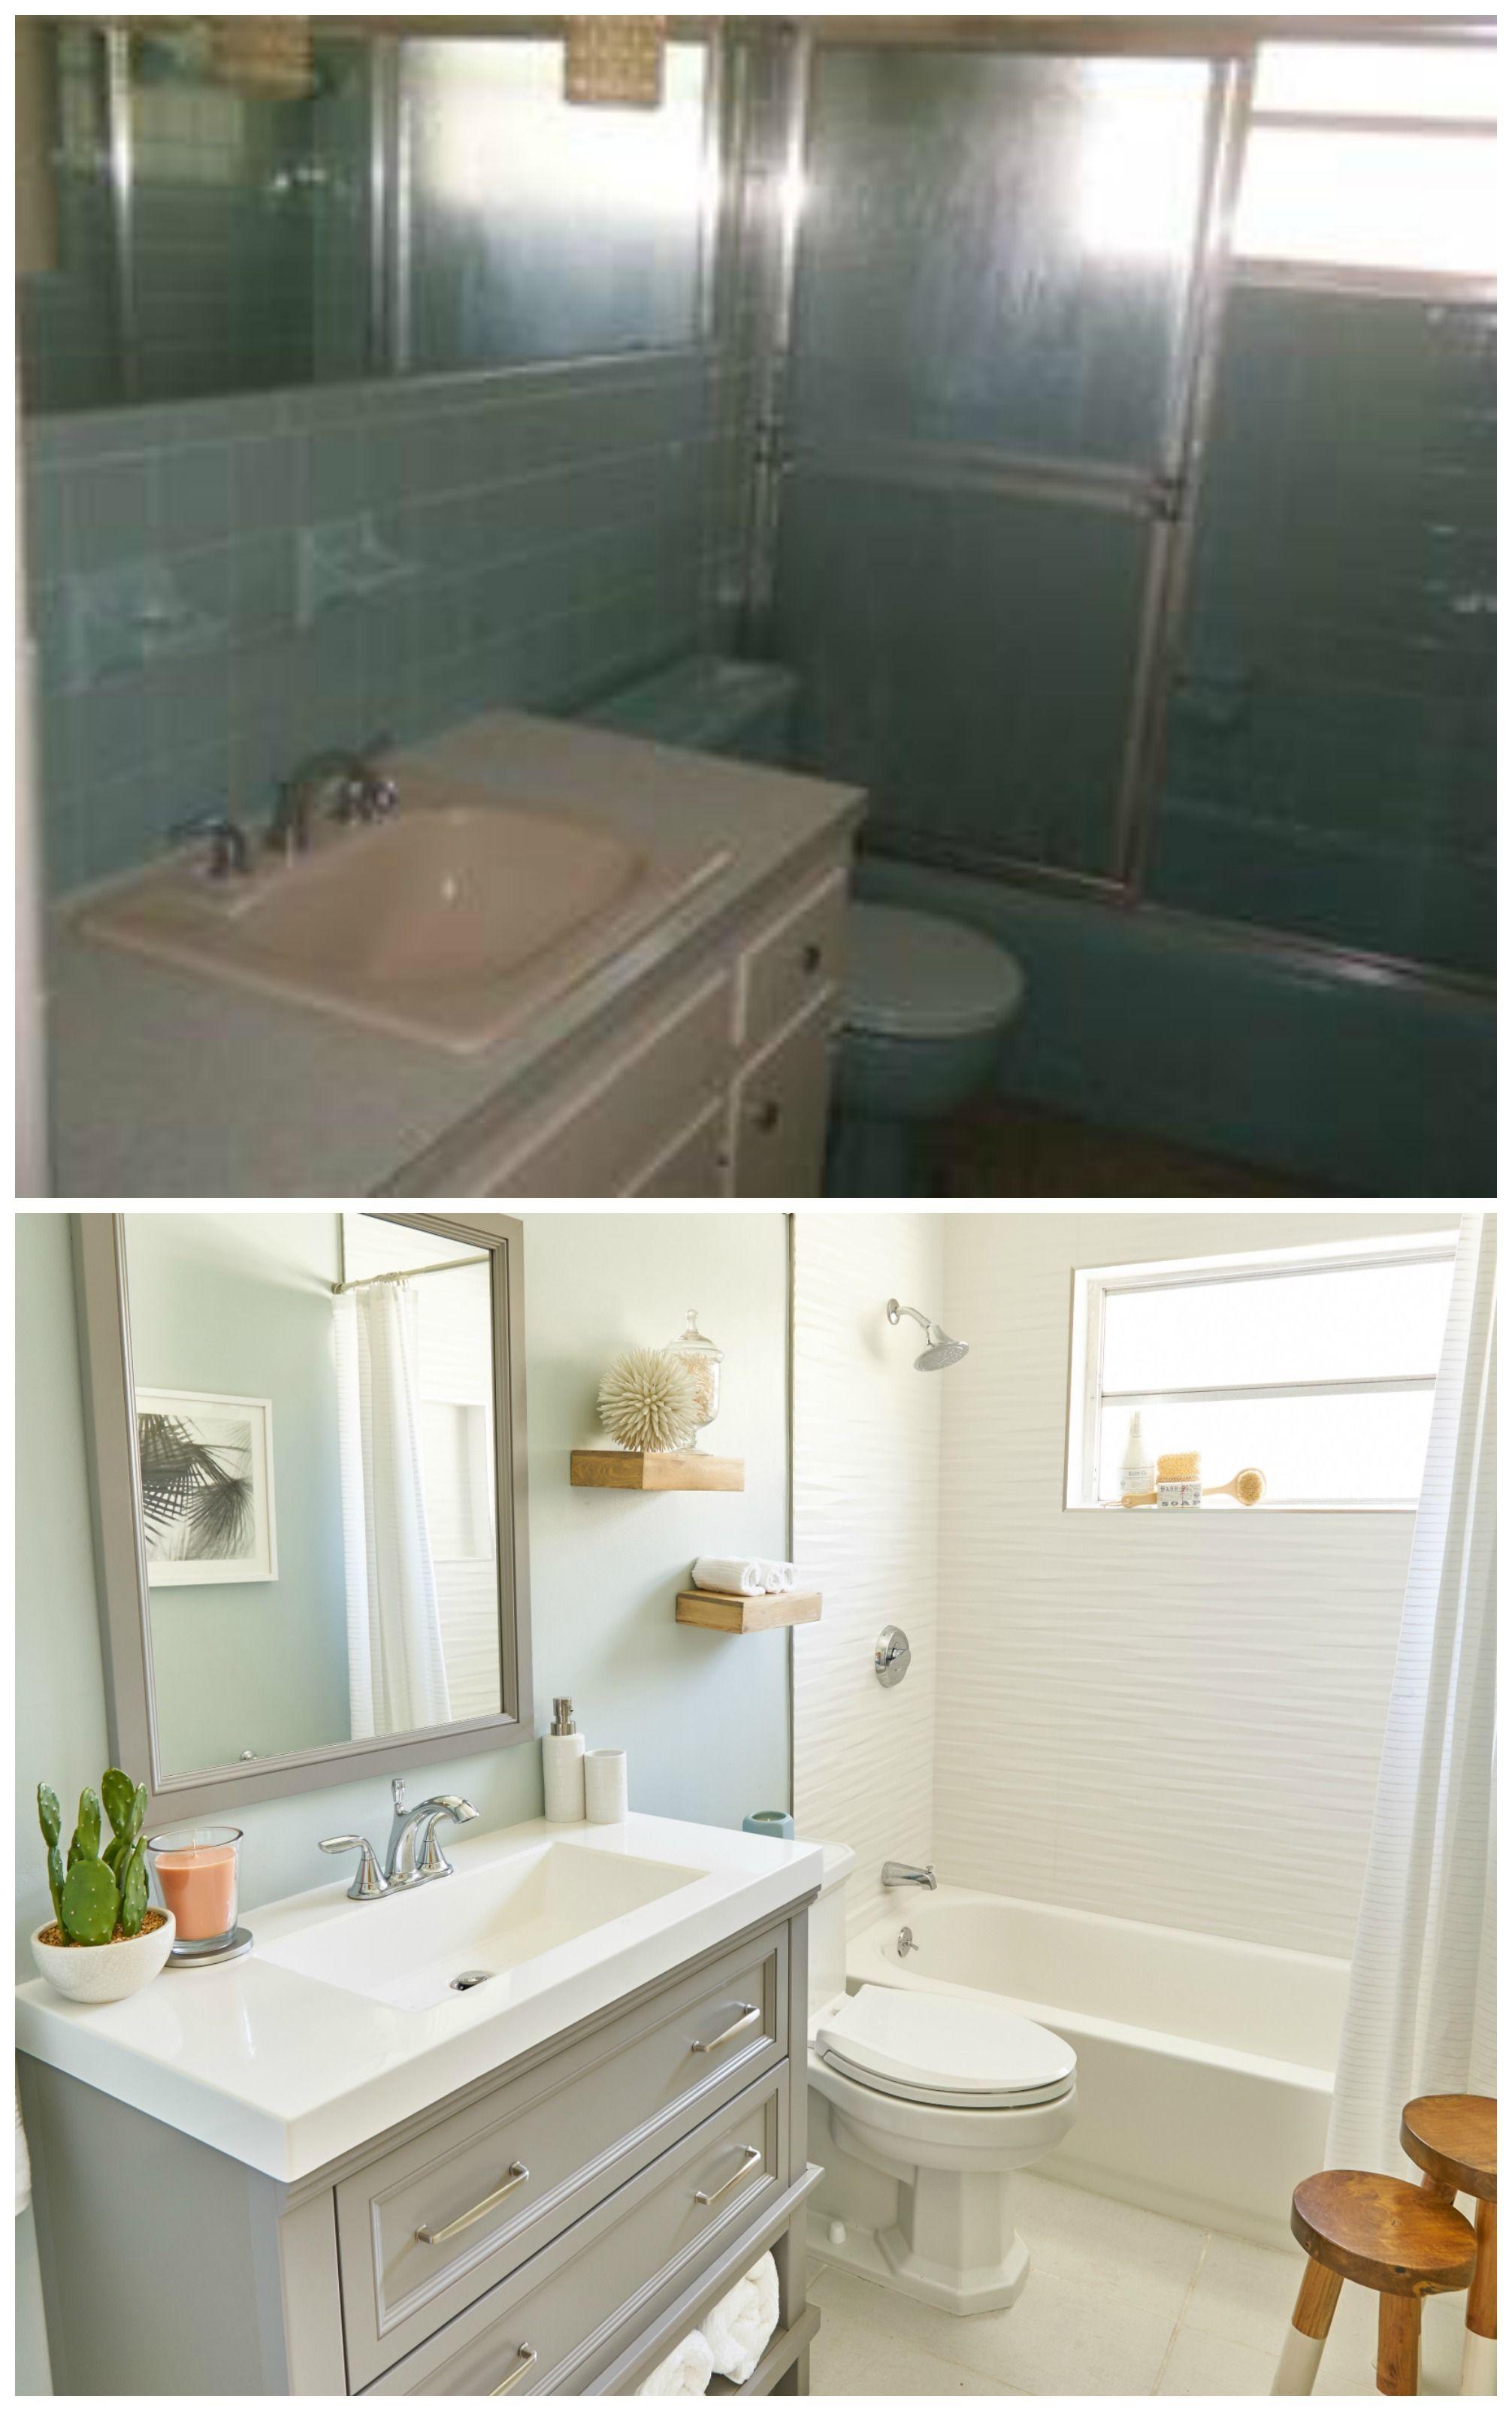 Bathroom makeover featuring the Scott McGillivray